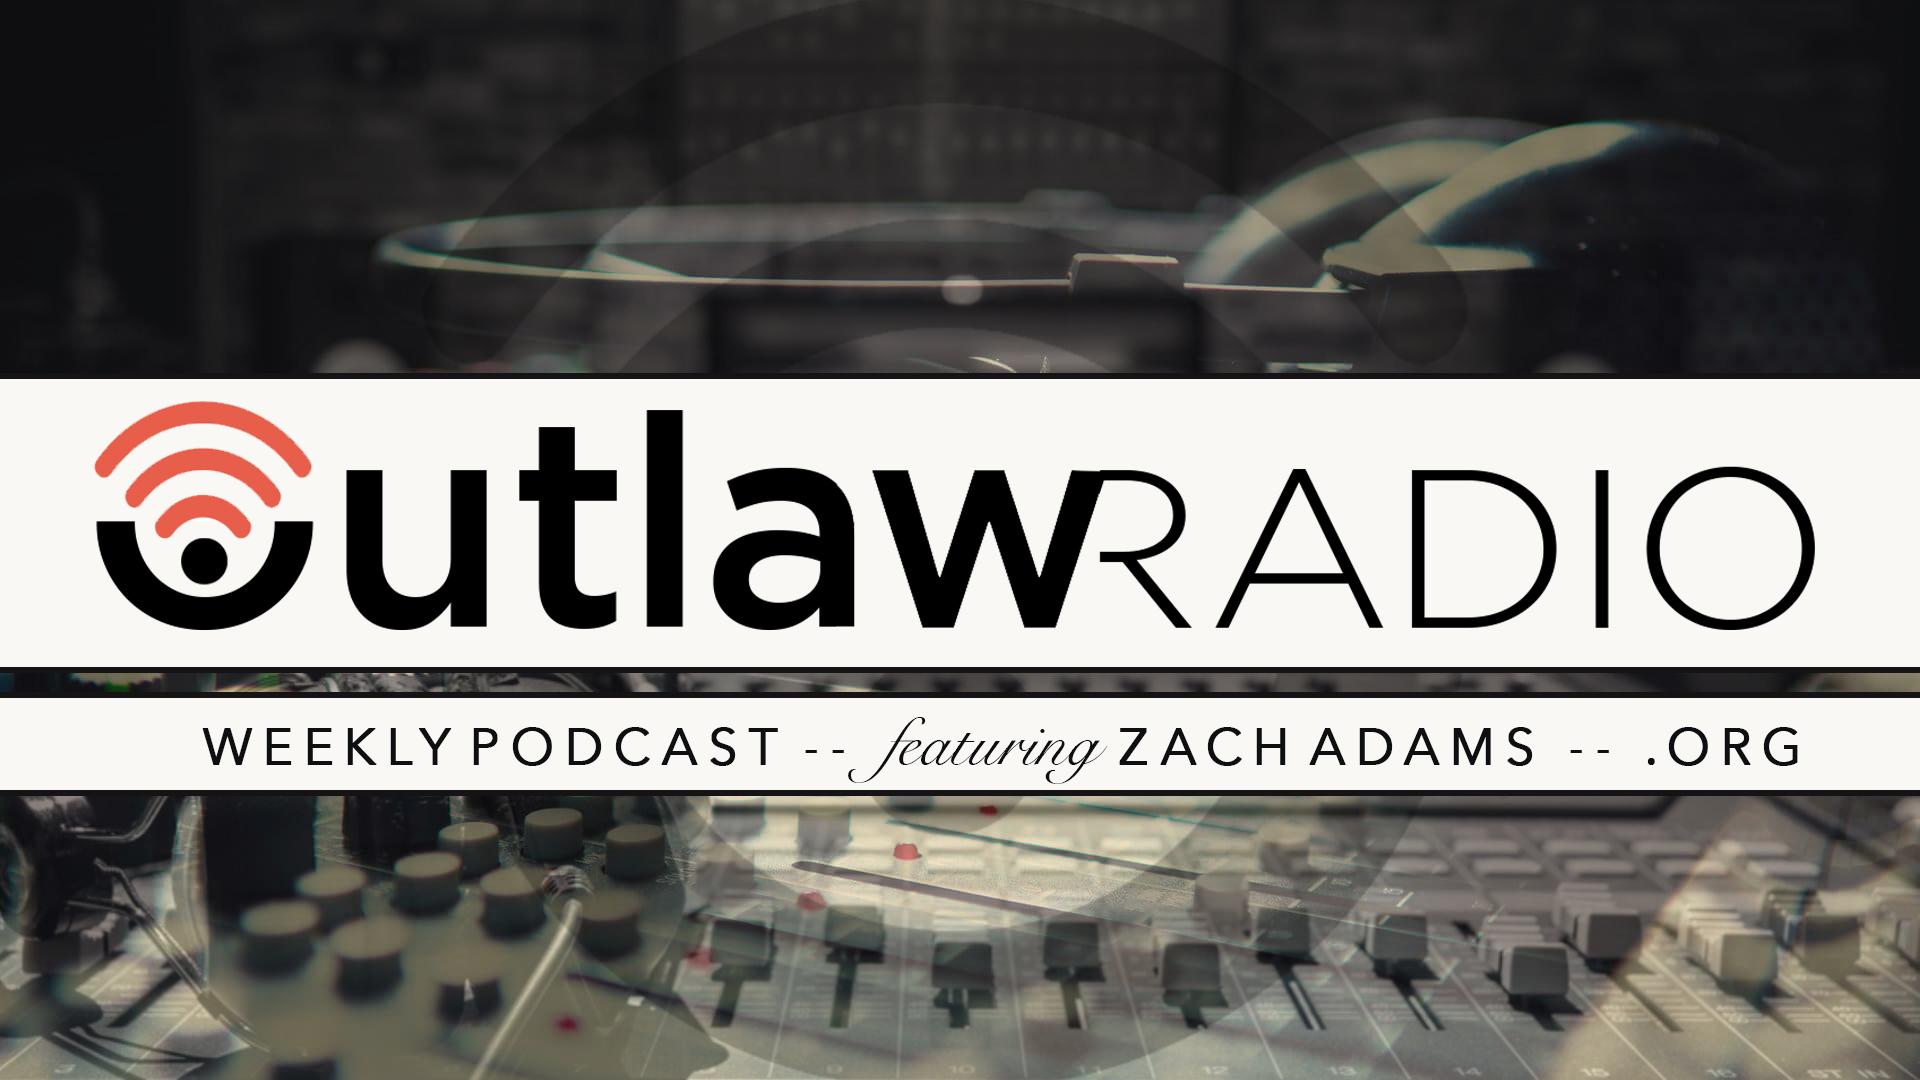 OutlawRadio